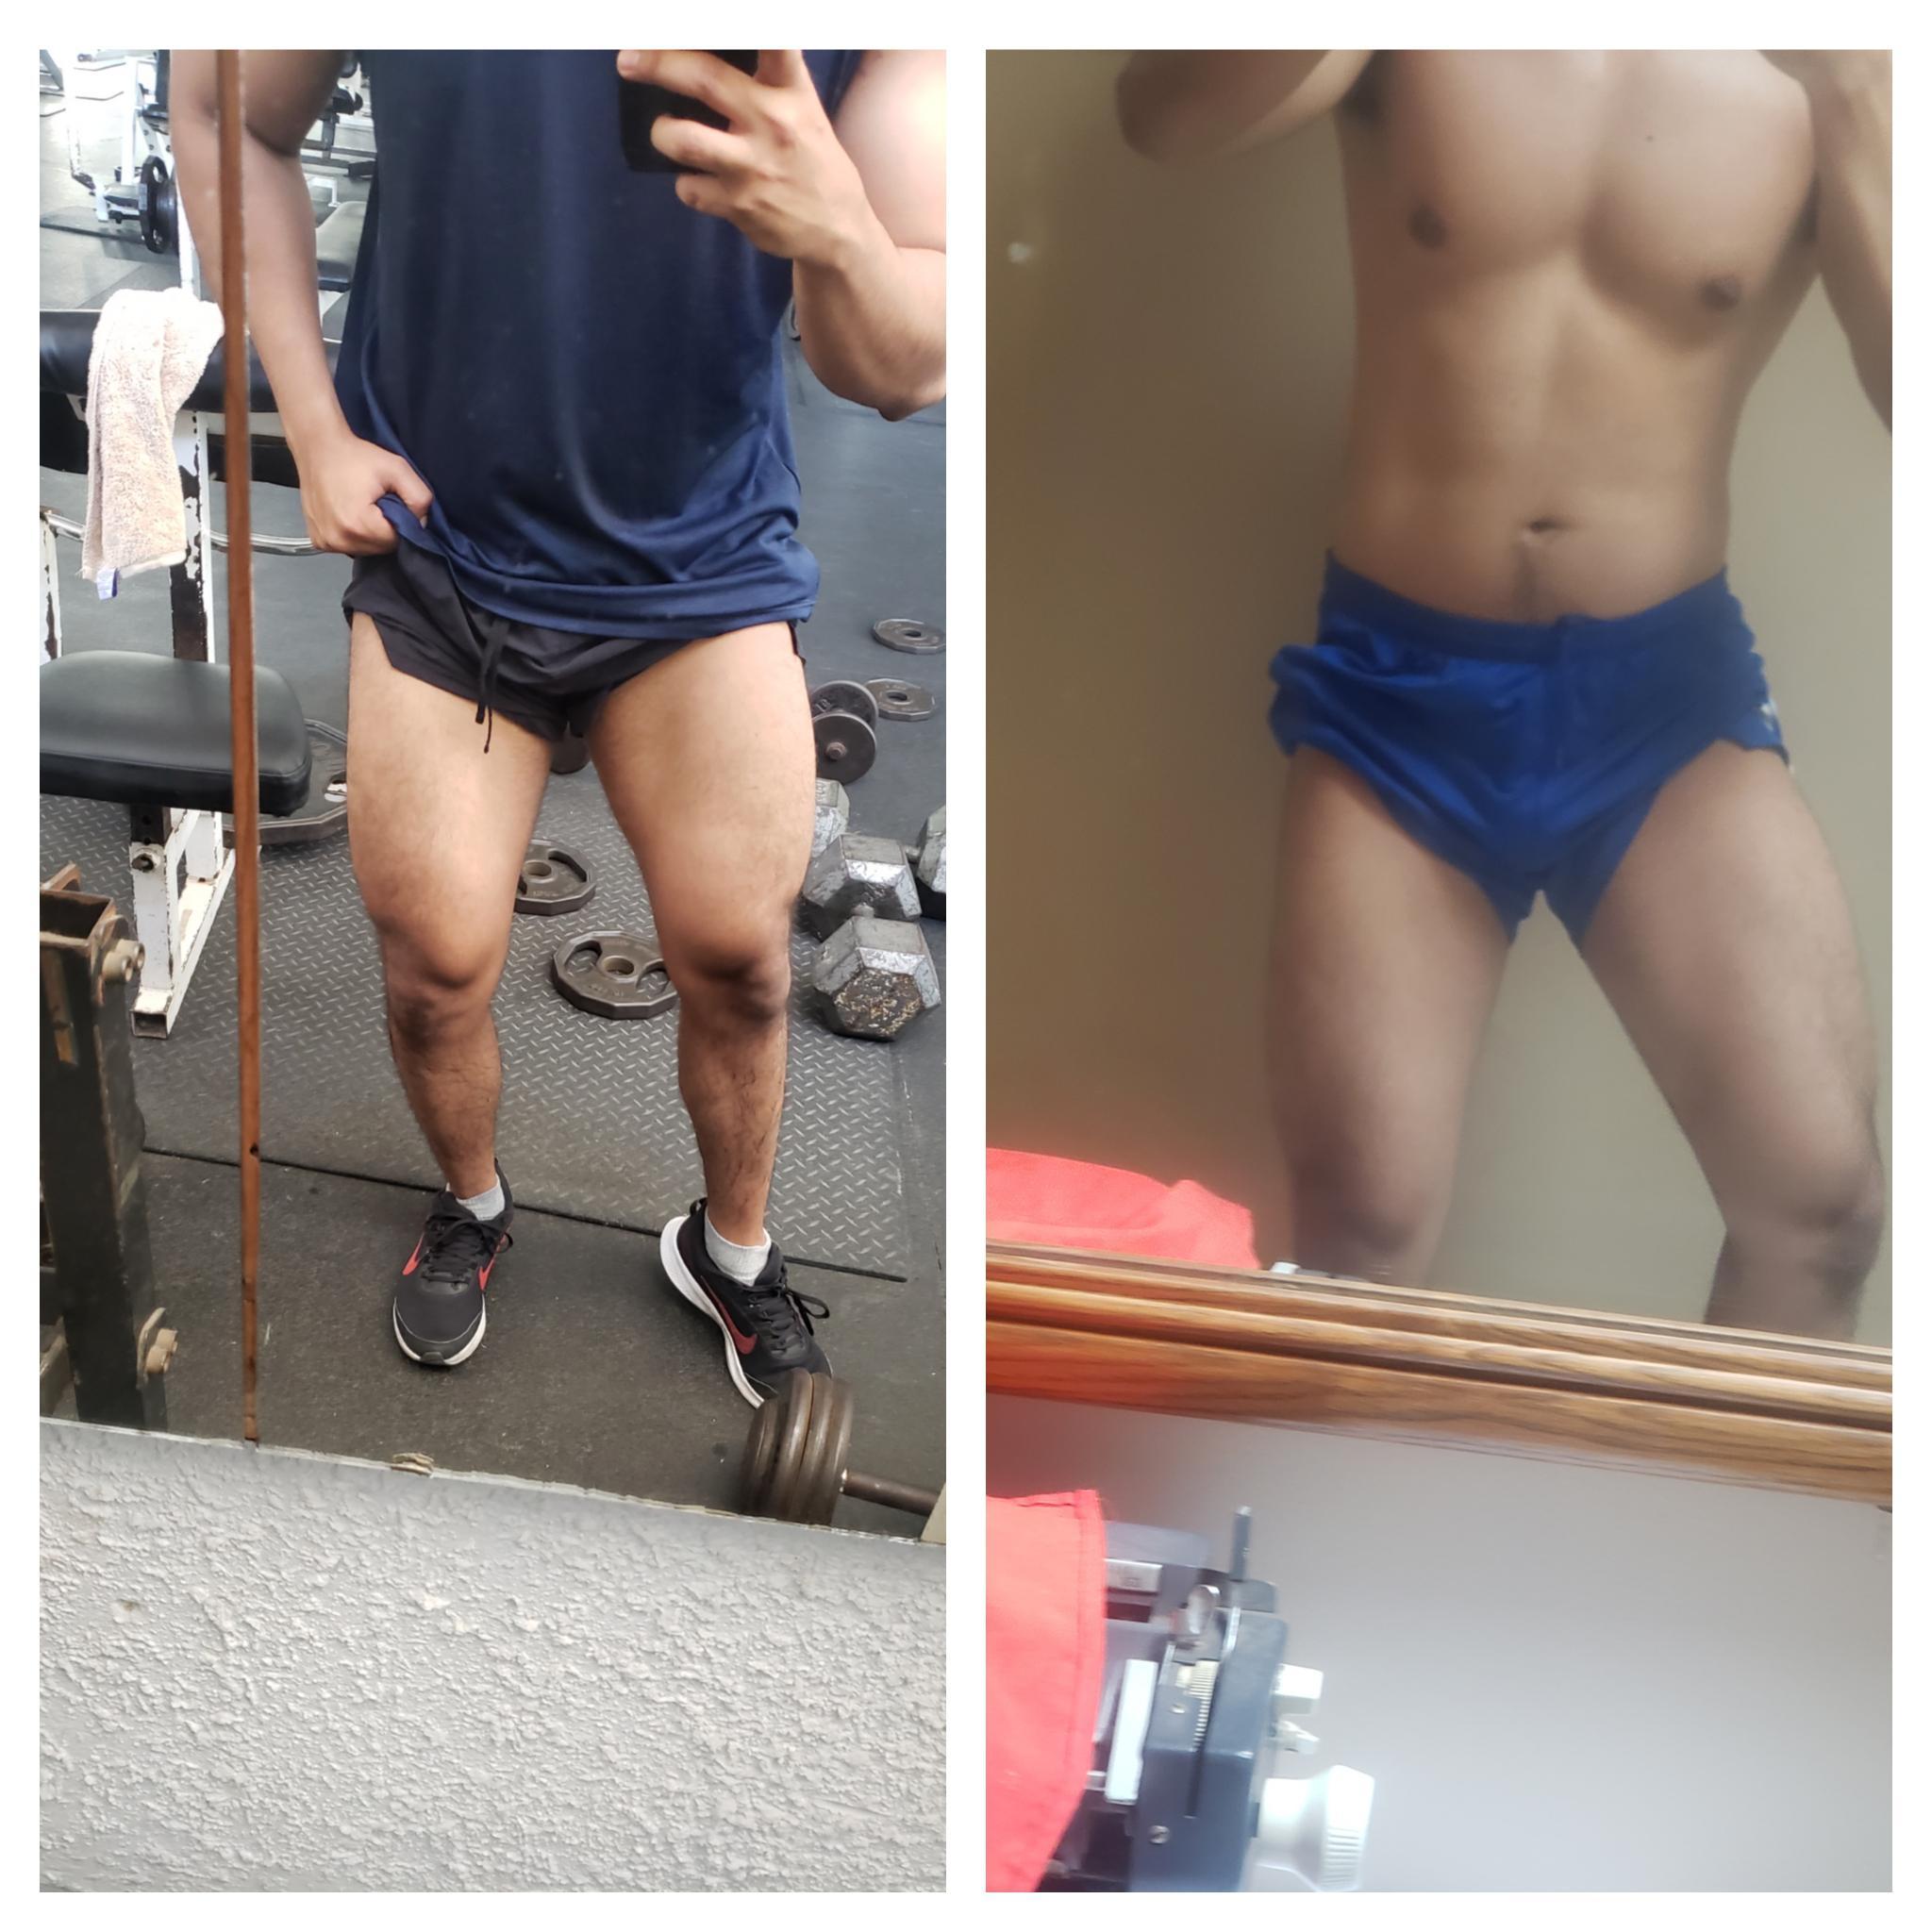 20 lbs Weight Gain 5 feet 11 Male 170 lbs to 190 lbs